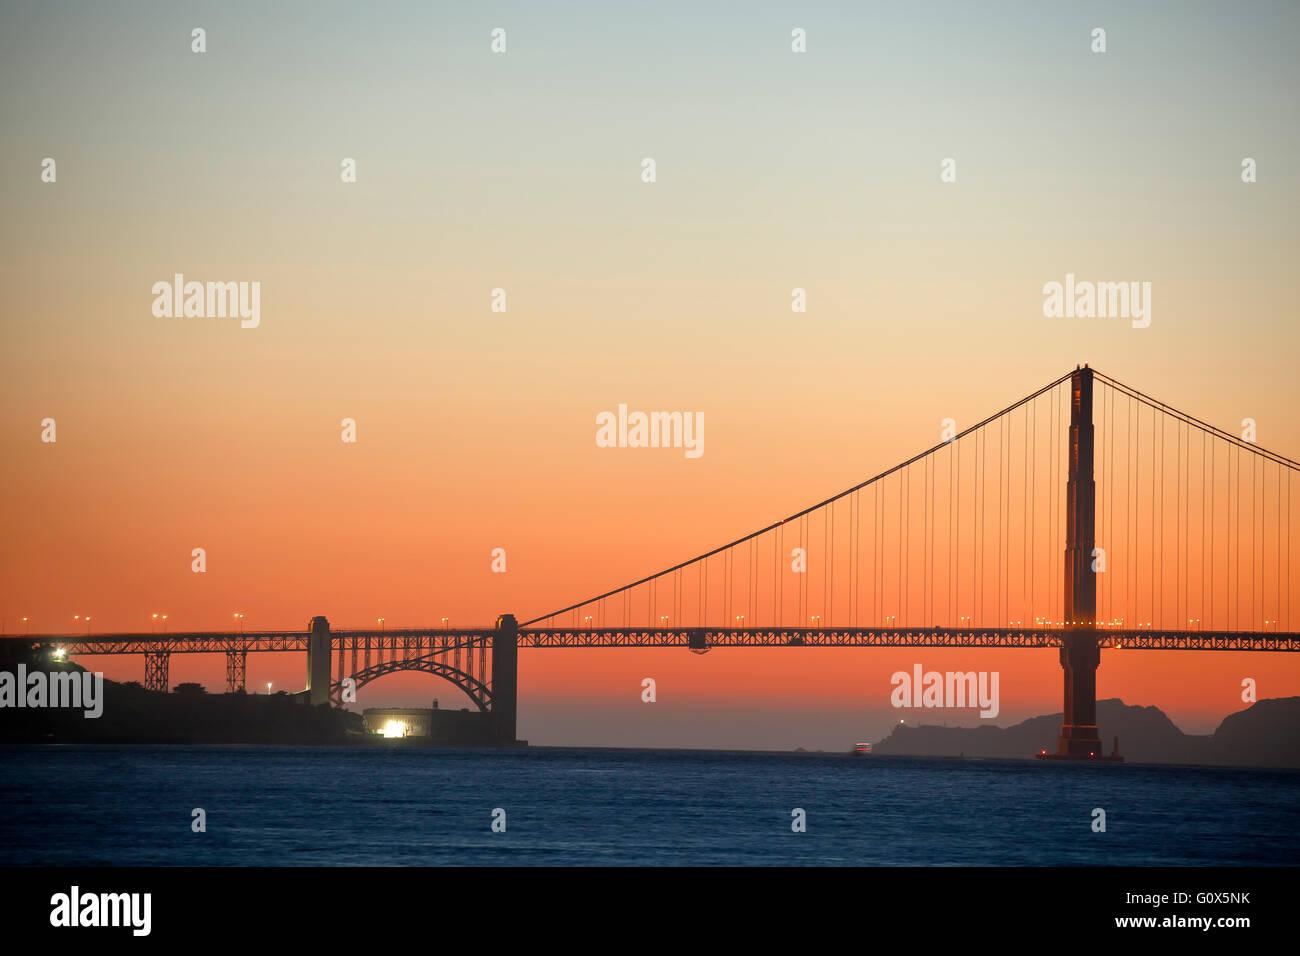 Puente Golden Gate, San Francisco, California, EE.UU. Foto de stock